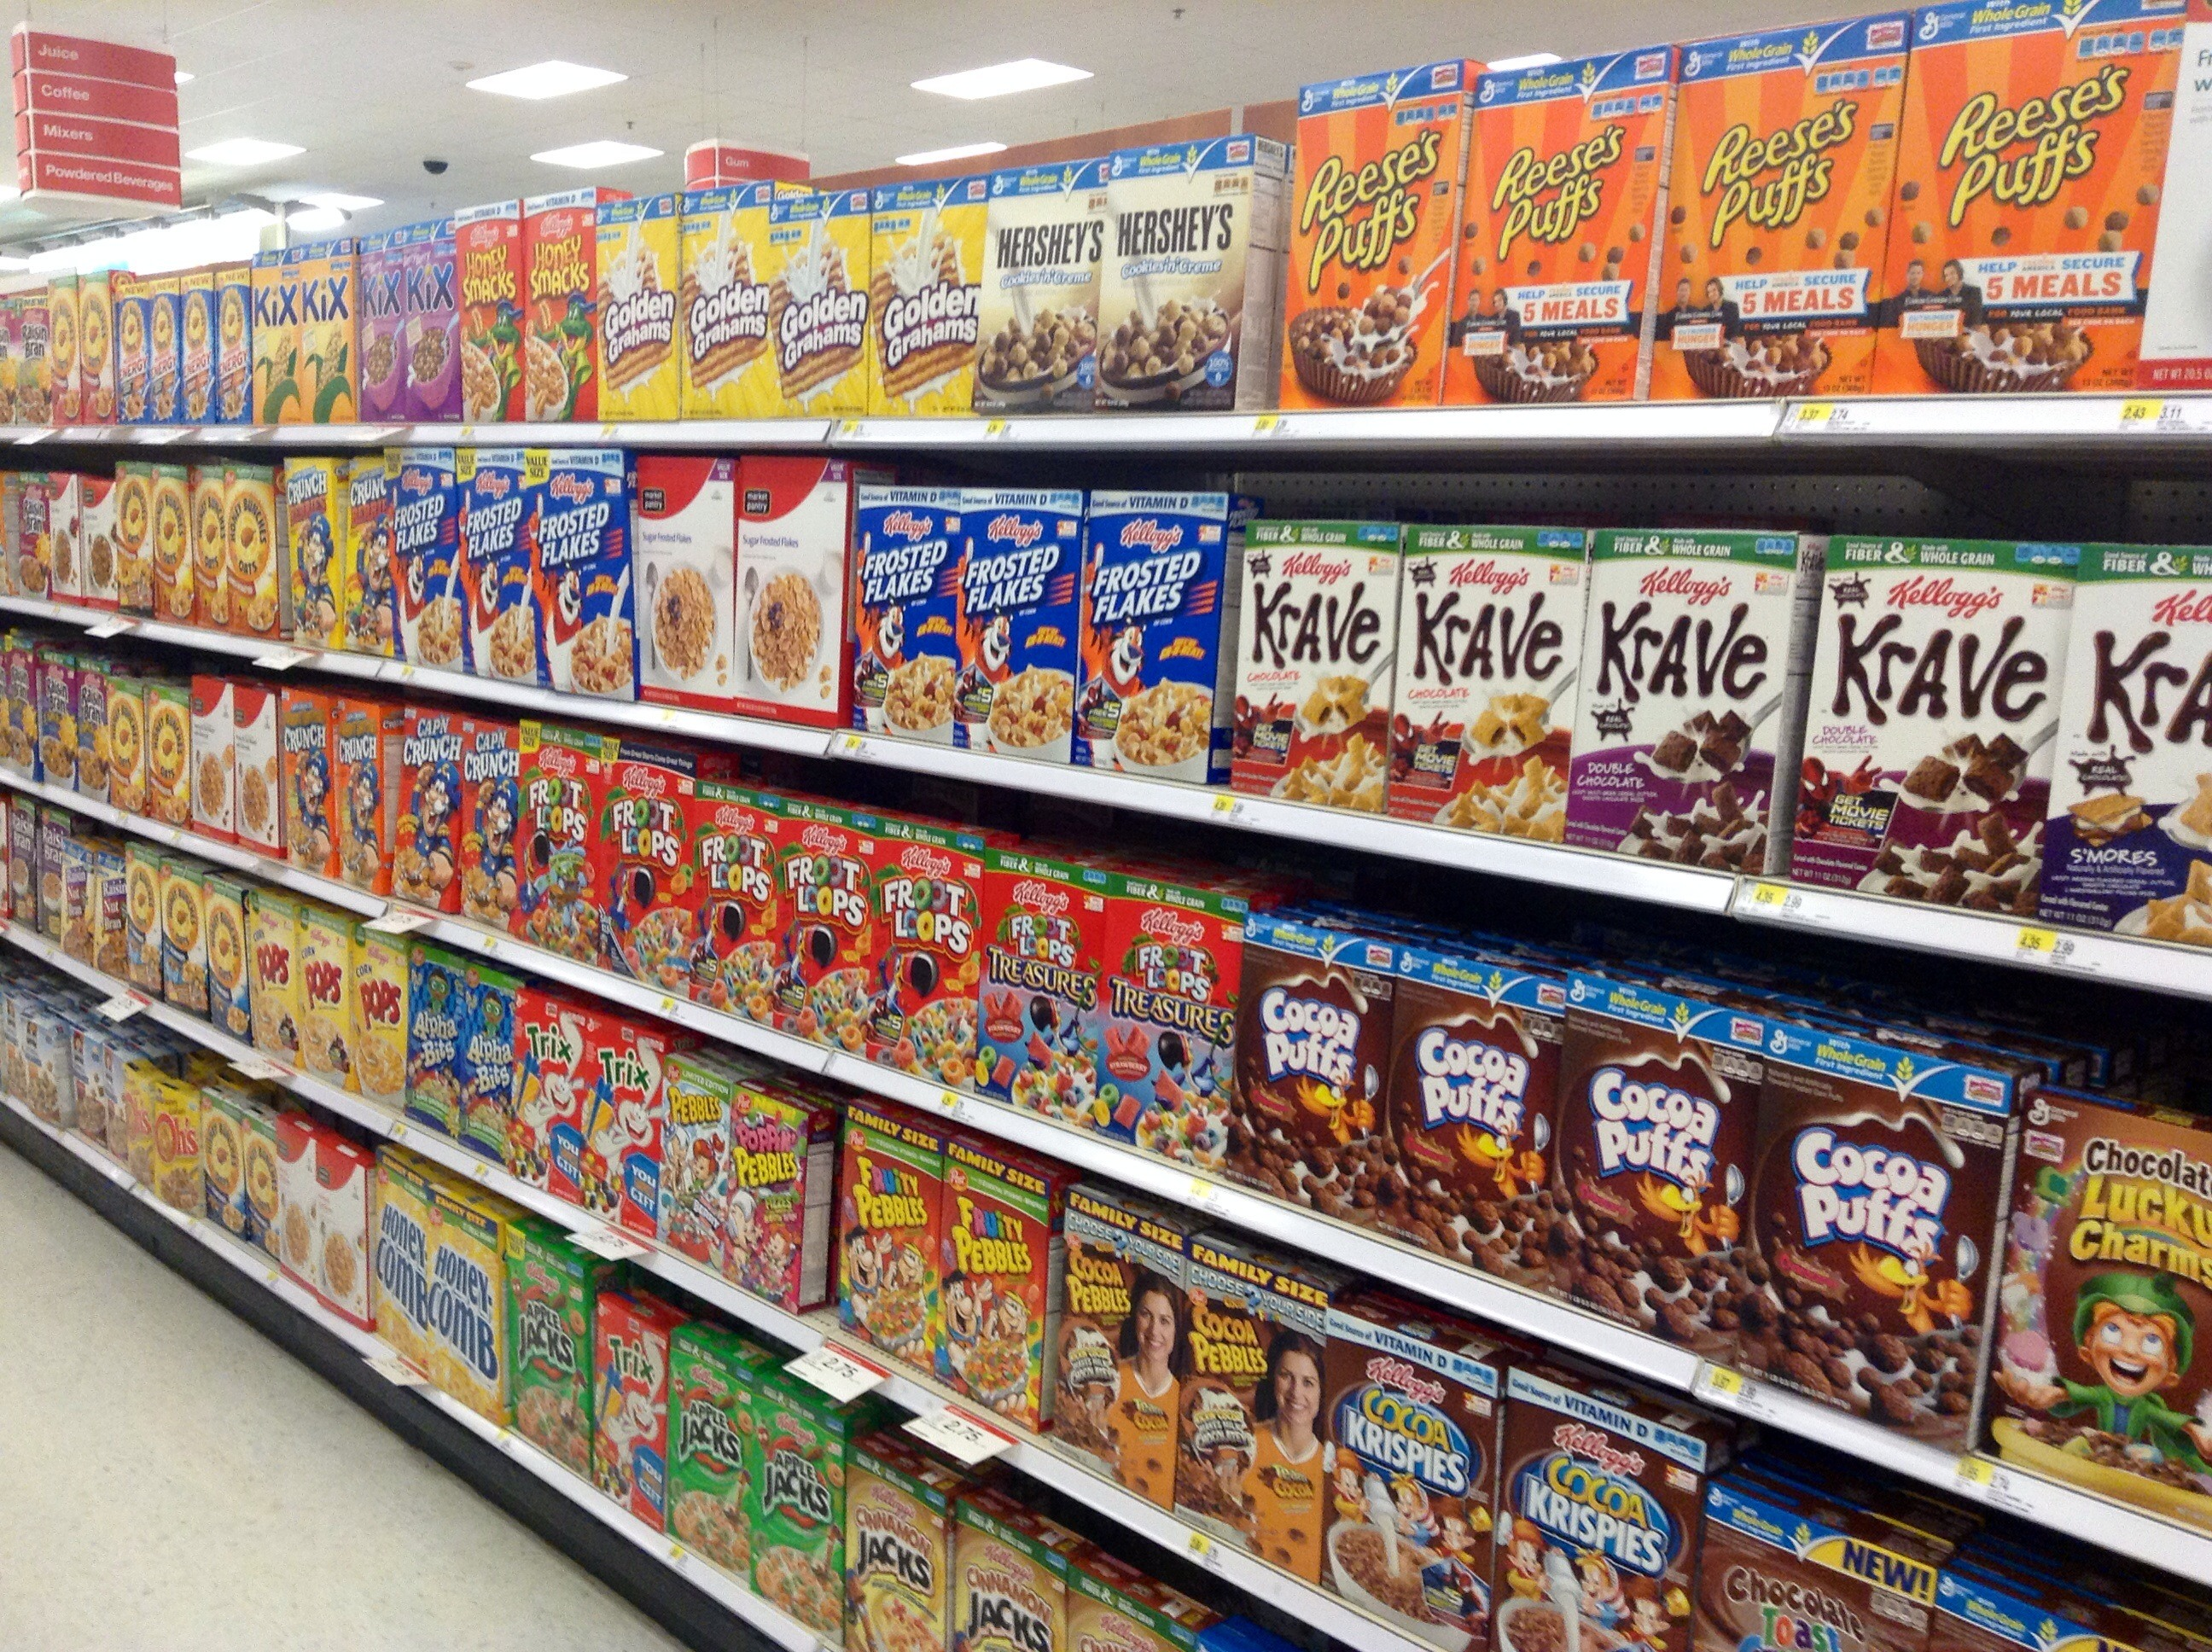 Breakfast cereals in aisle of supermarket.